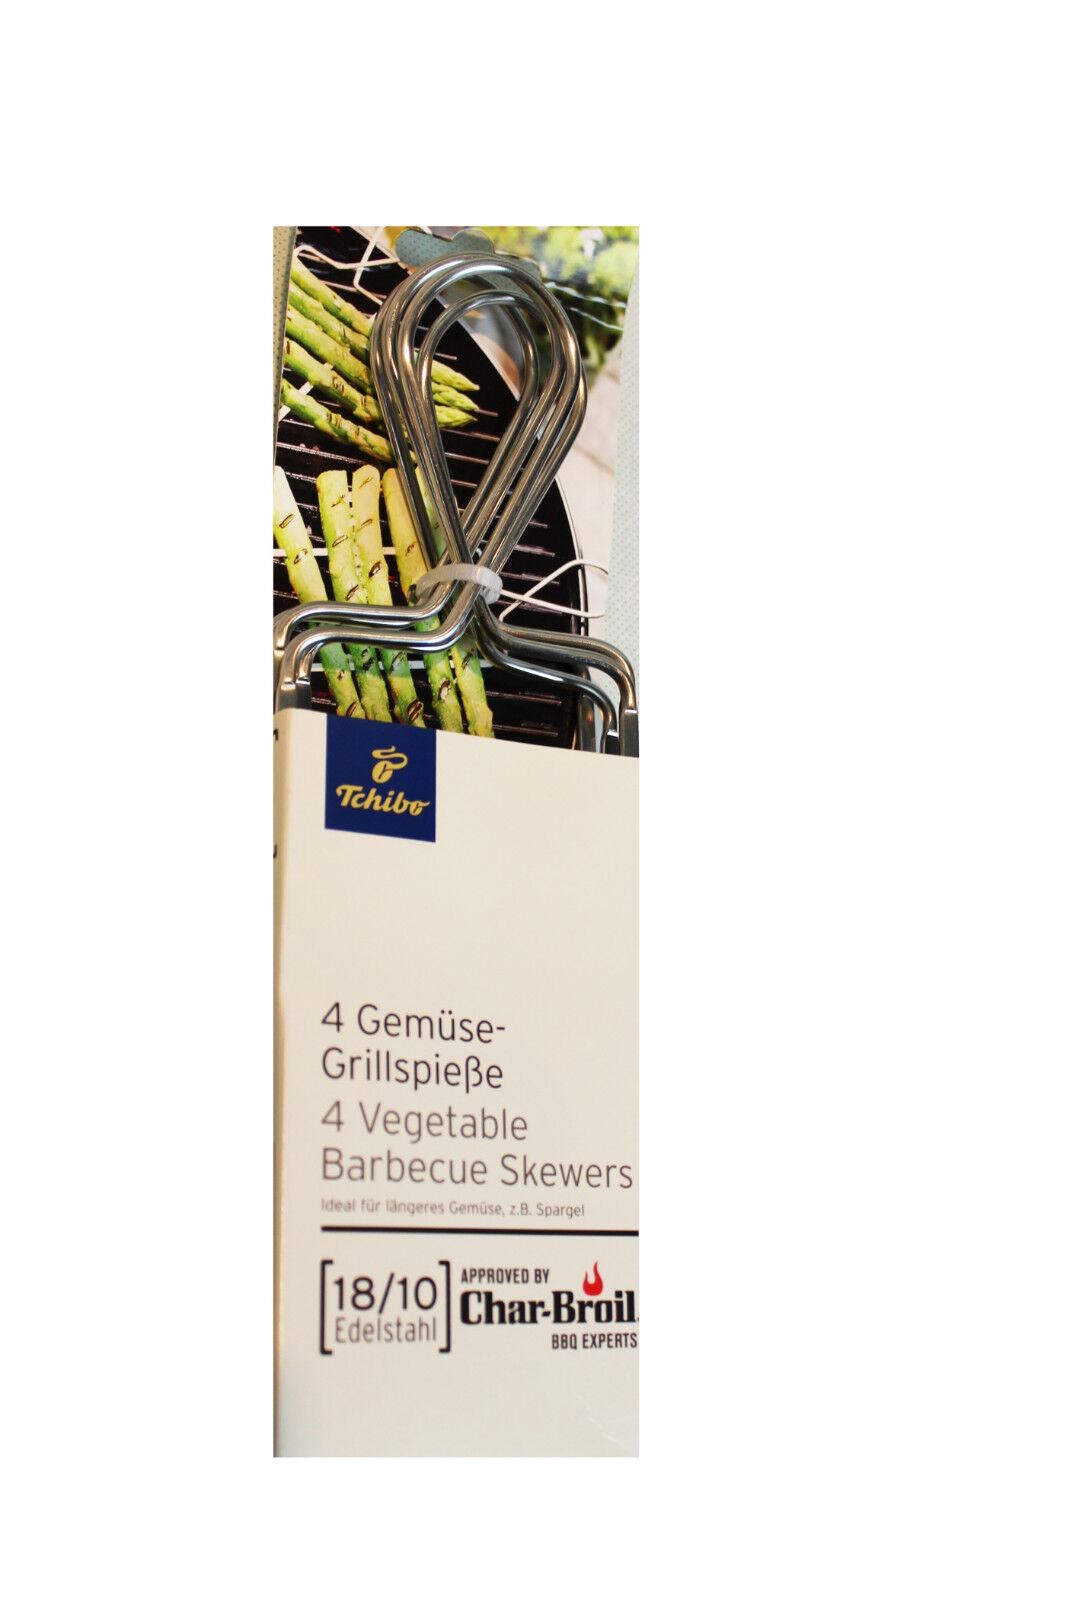 TCM Tchibo 4 Gemüsespieße Grillspieße Grillen Spieße